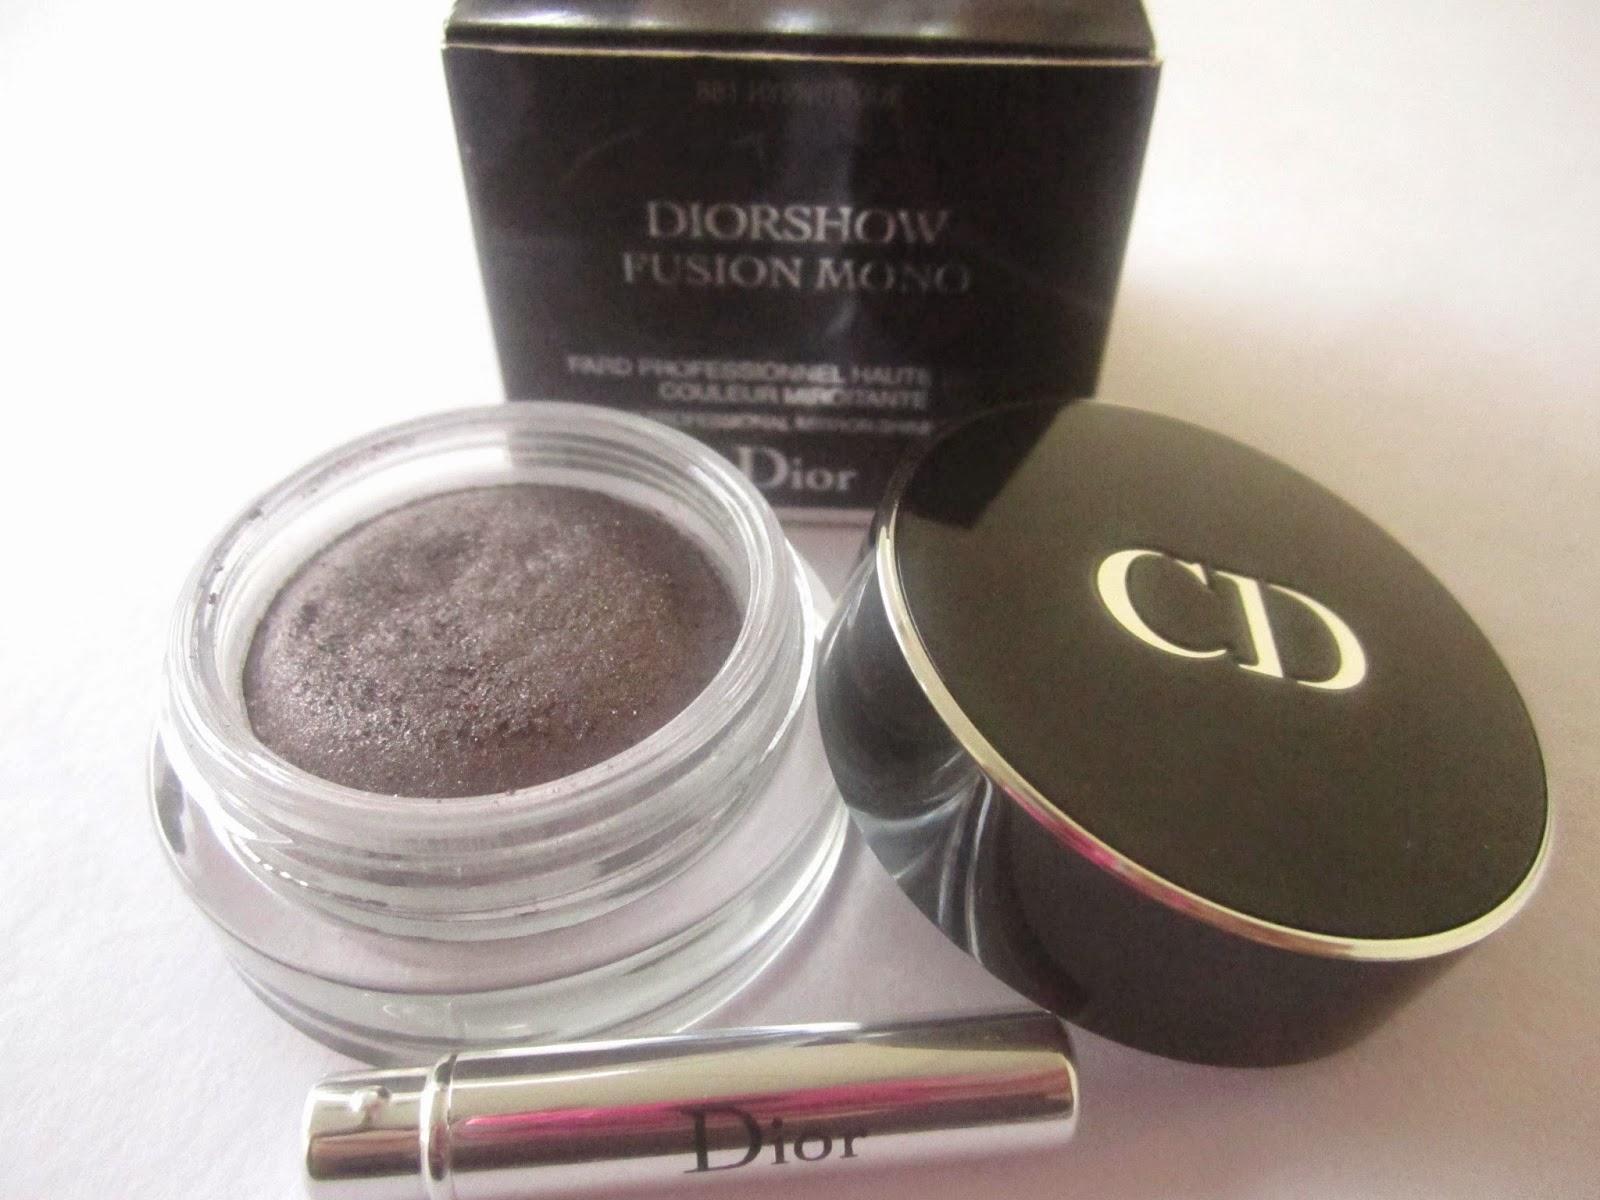 Diorshow Fusion Mono Eyeshadows in Hypnotique